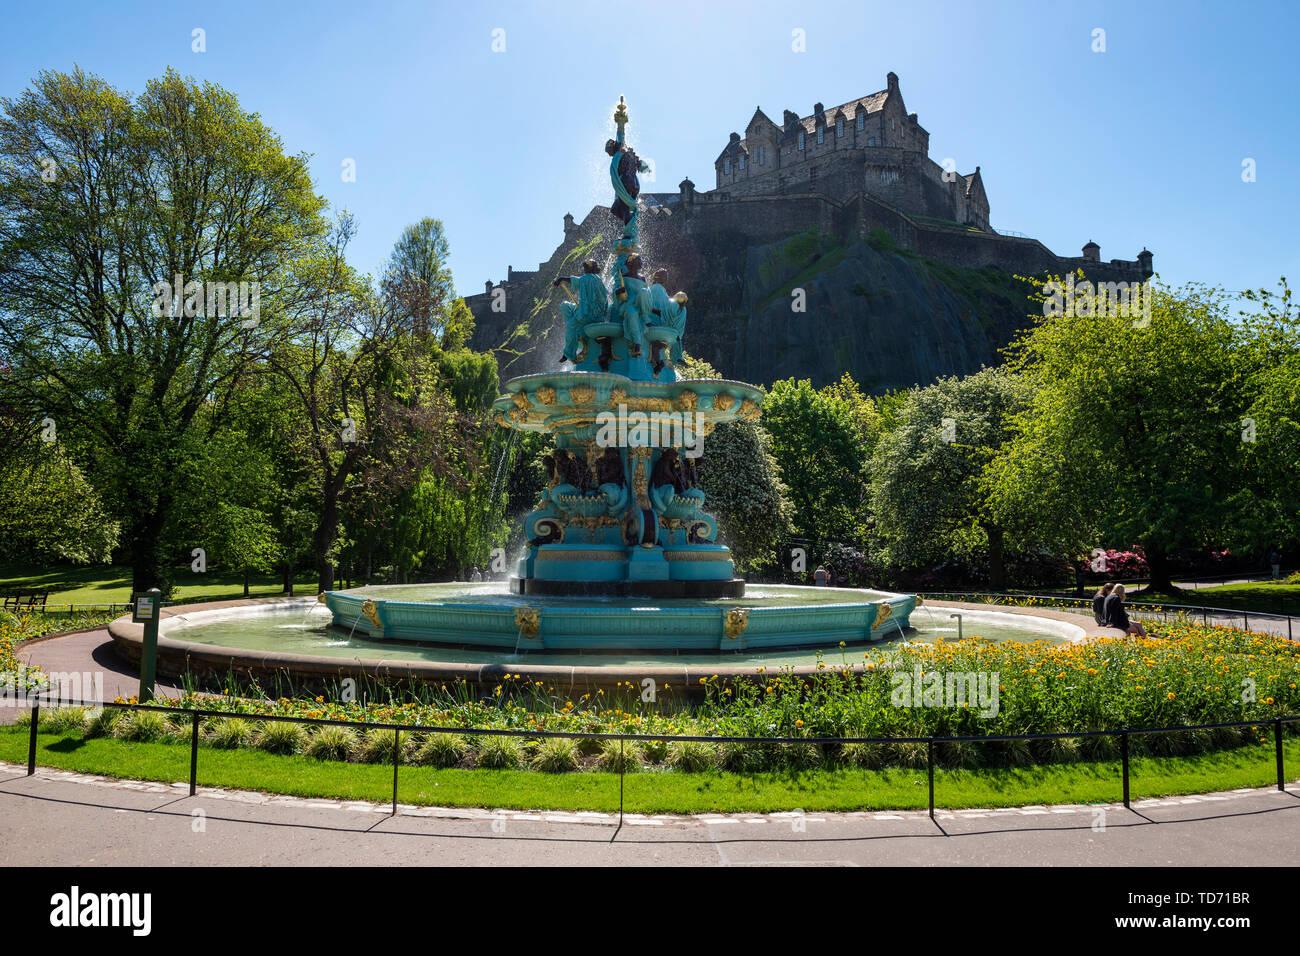 Refurbished Ross Fountain in West Princes Street Gardens in Edinburgh, Scotland, UK - Stock Image